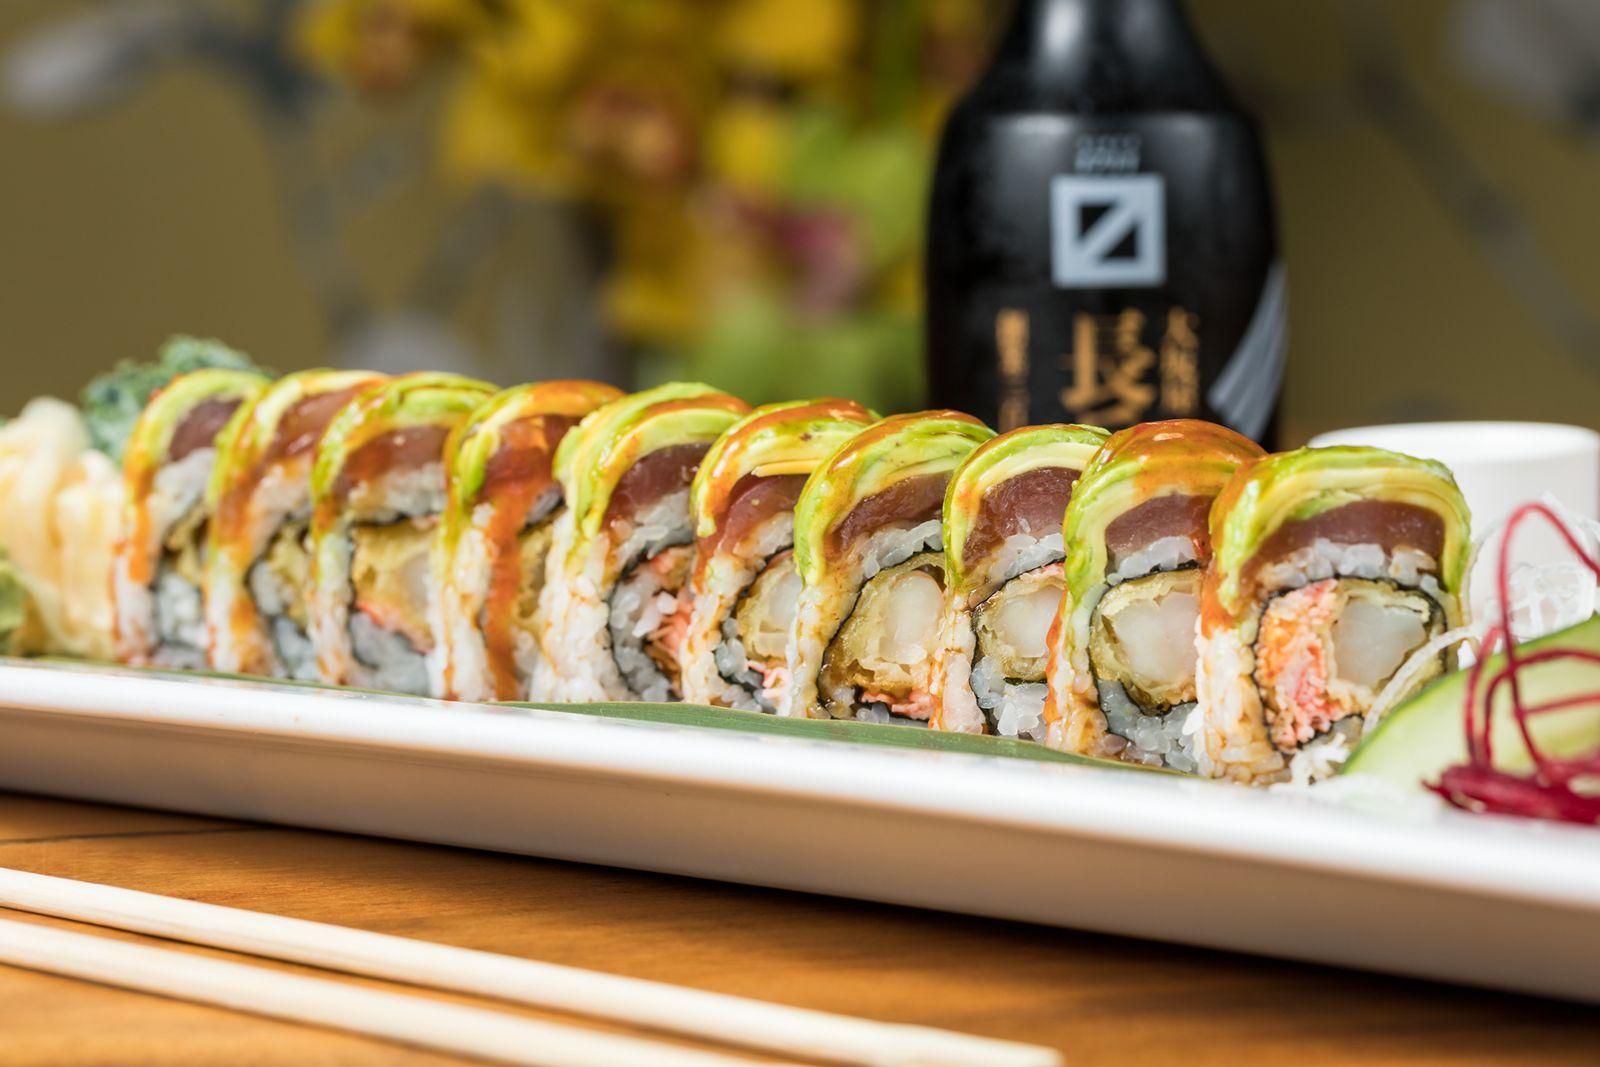 Late-Night, Miami-Based, Sushi Hotspot Looks to Expand Across Florida through Franchising